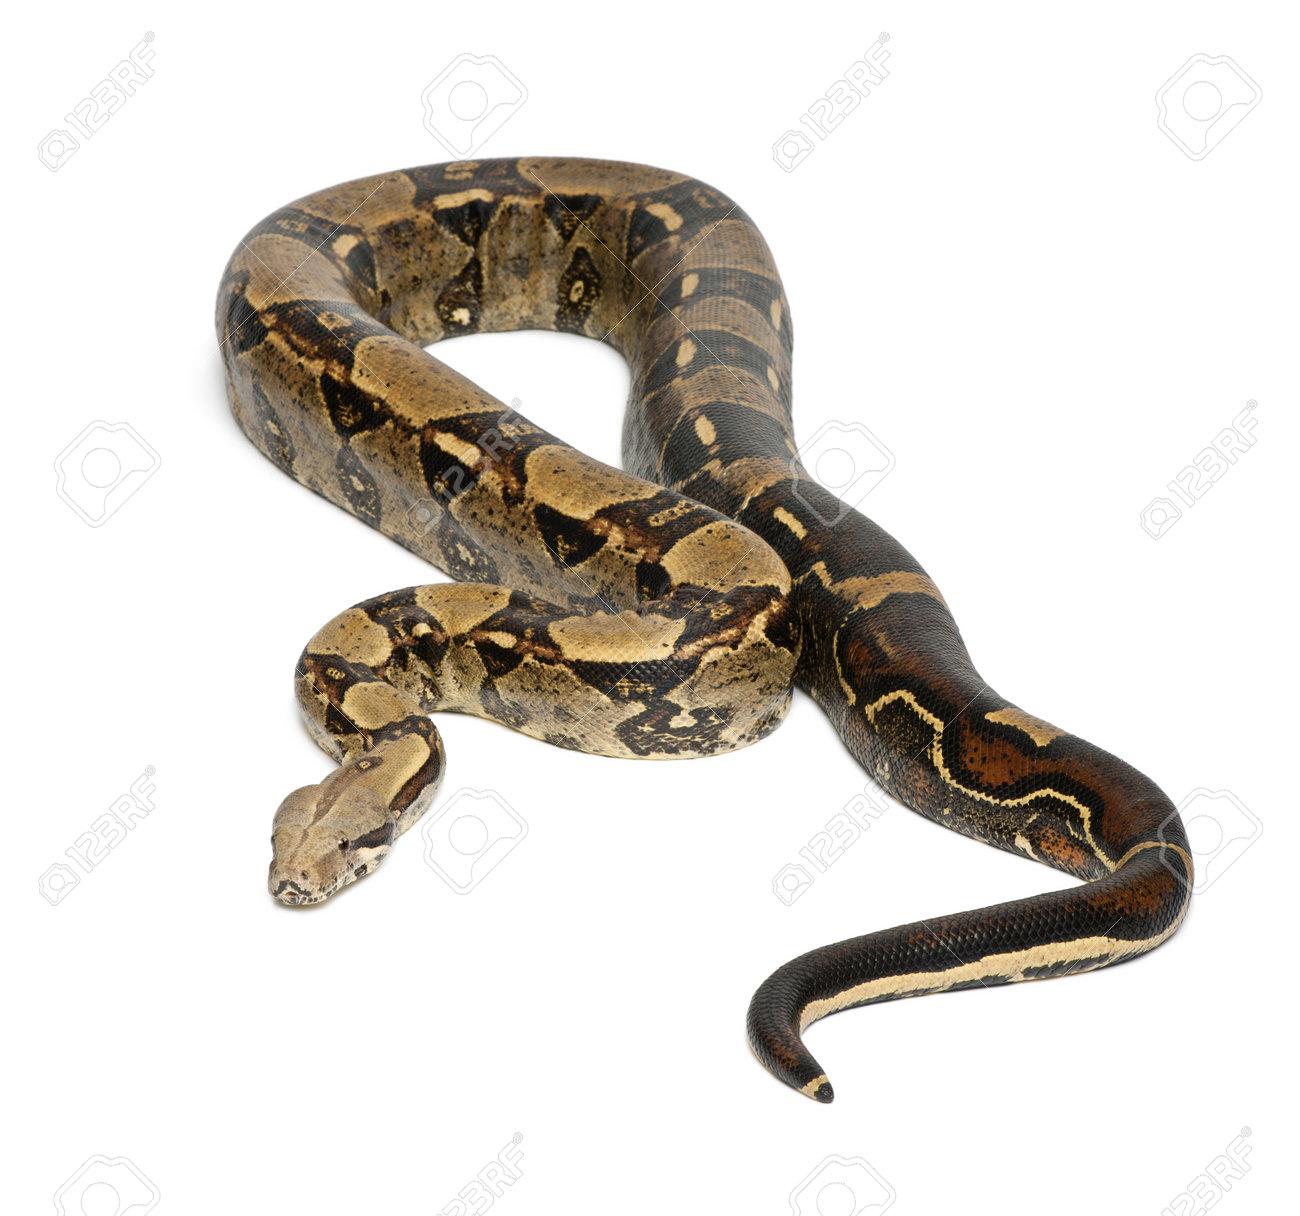 boa constrictor stock photos royalty free boa constrictor images